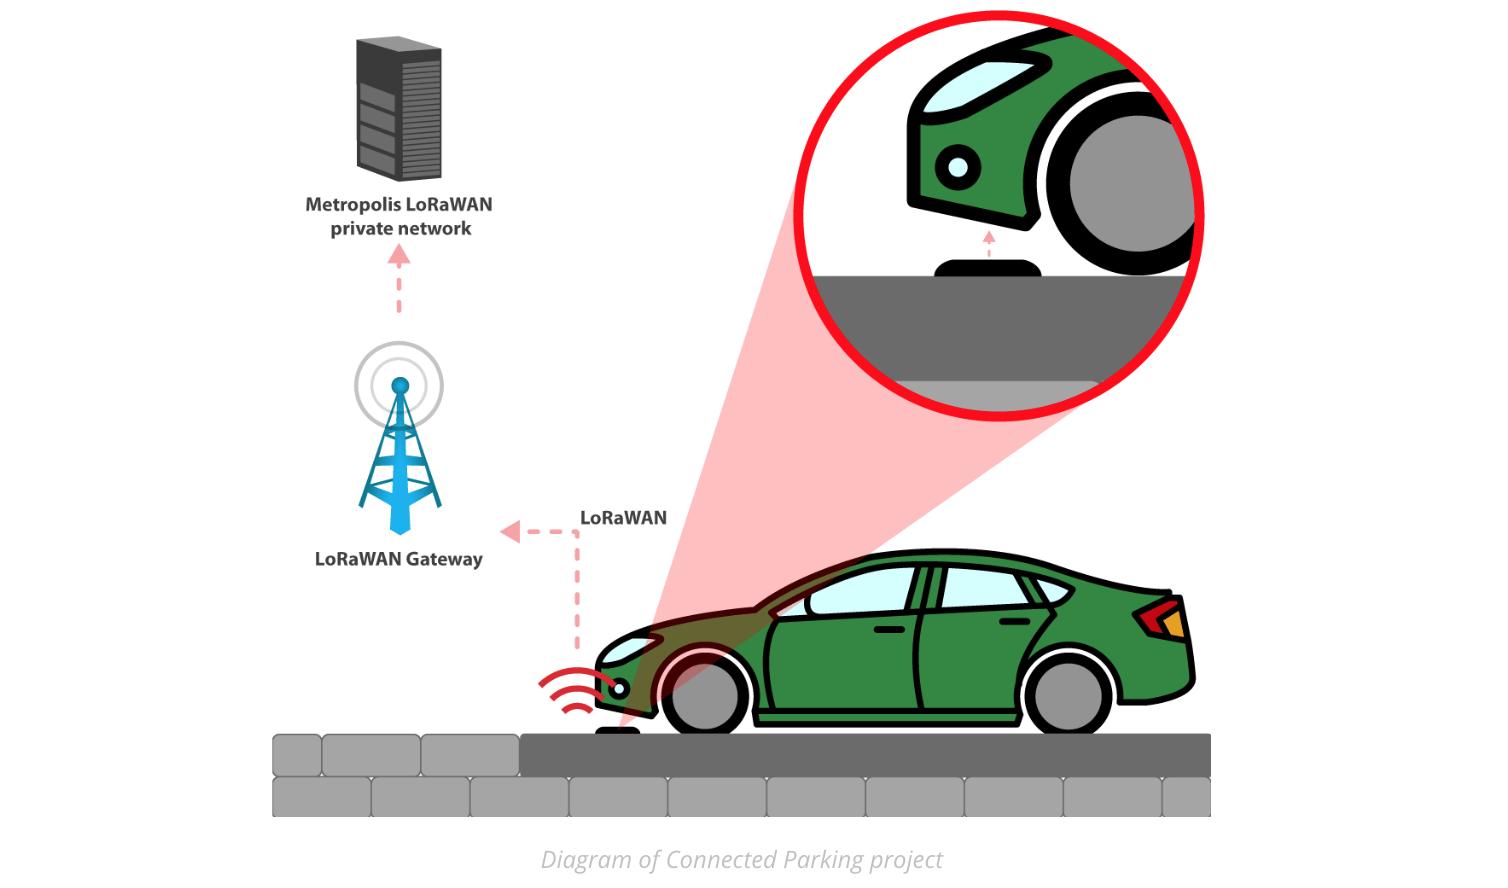 Iot Case Studies Smart Agriculture And Parking Block Diagram Of Vehicle Image Courtesy Libelium